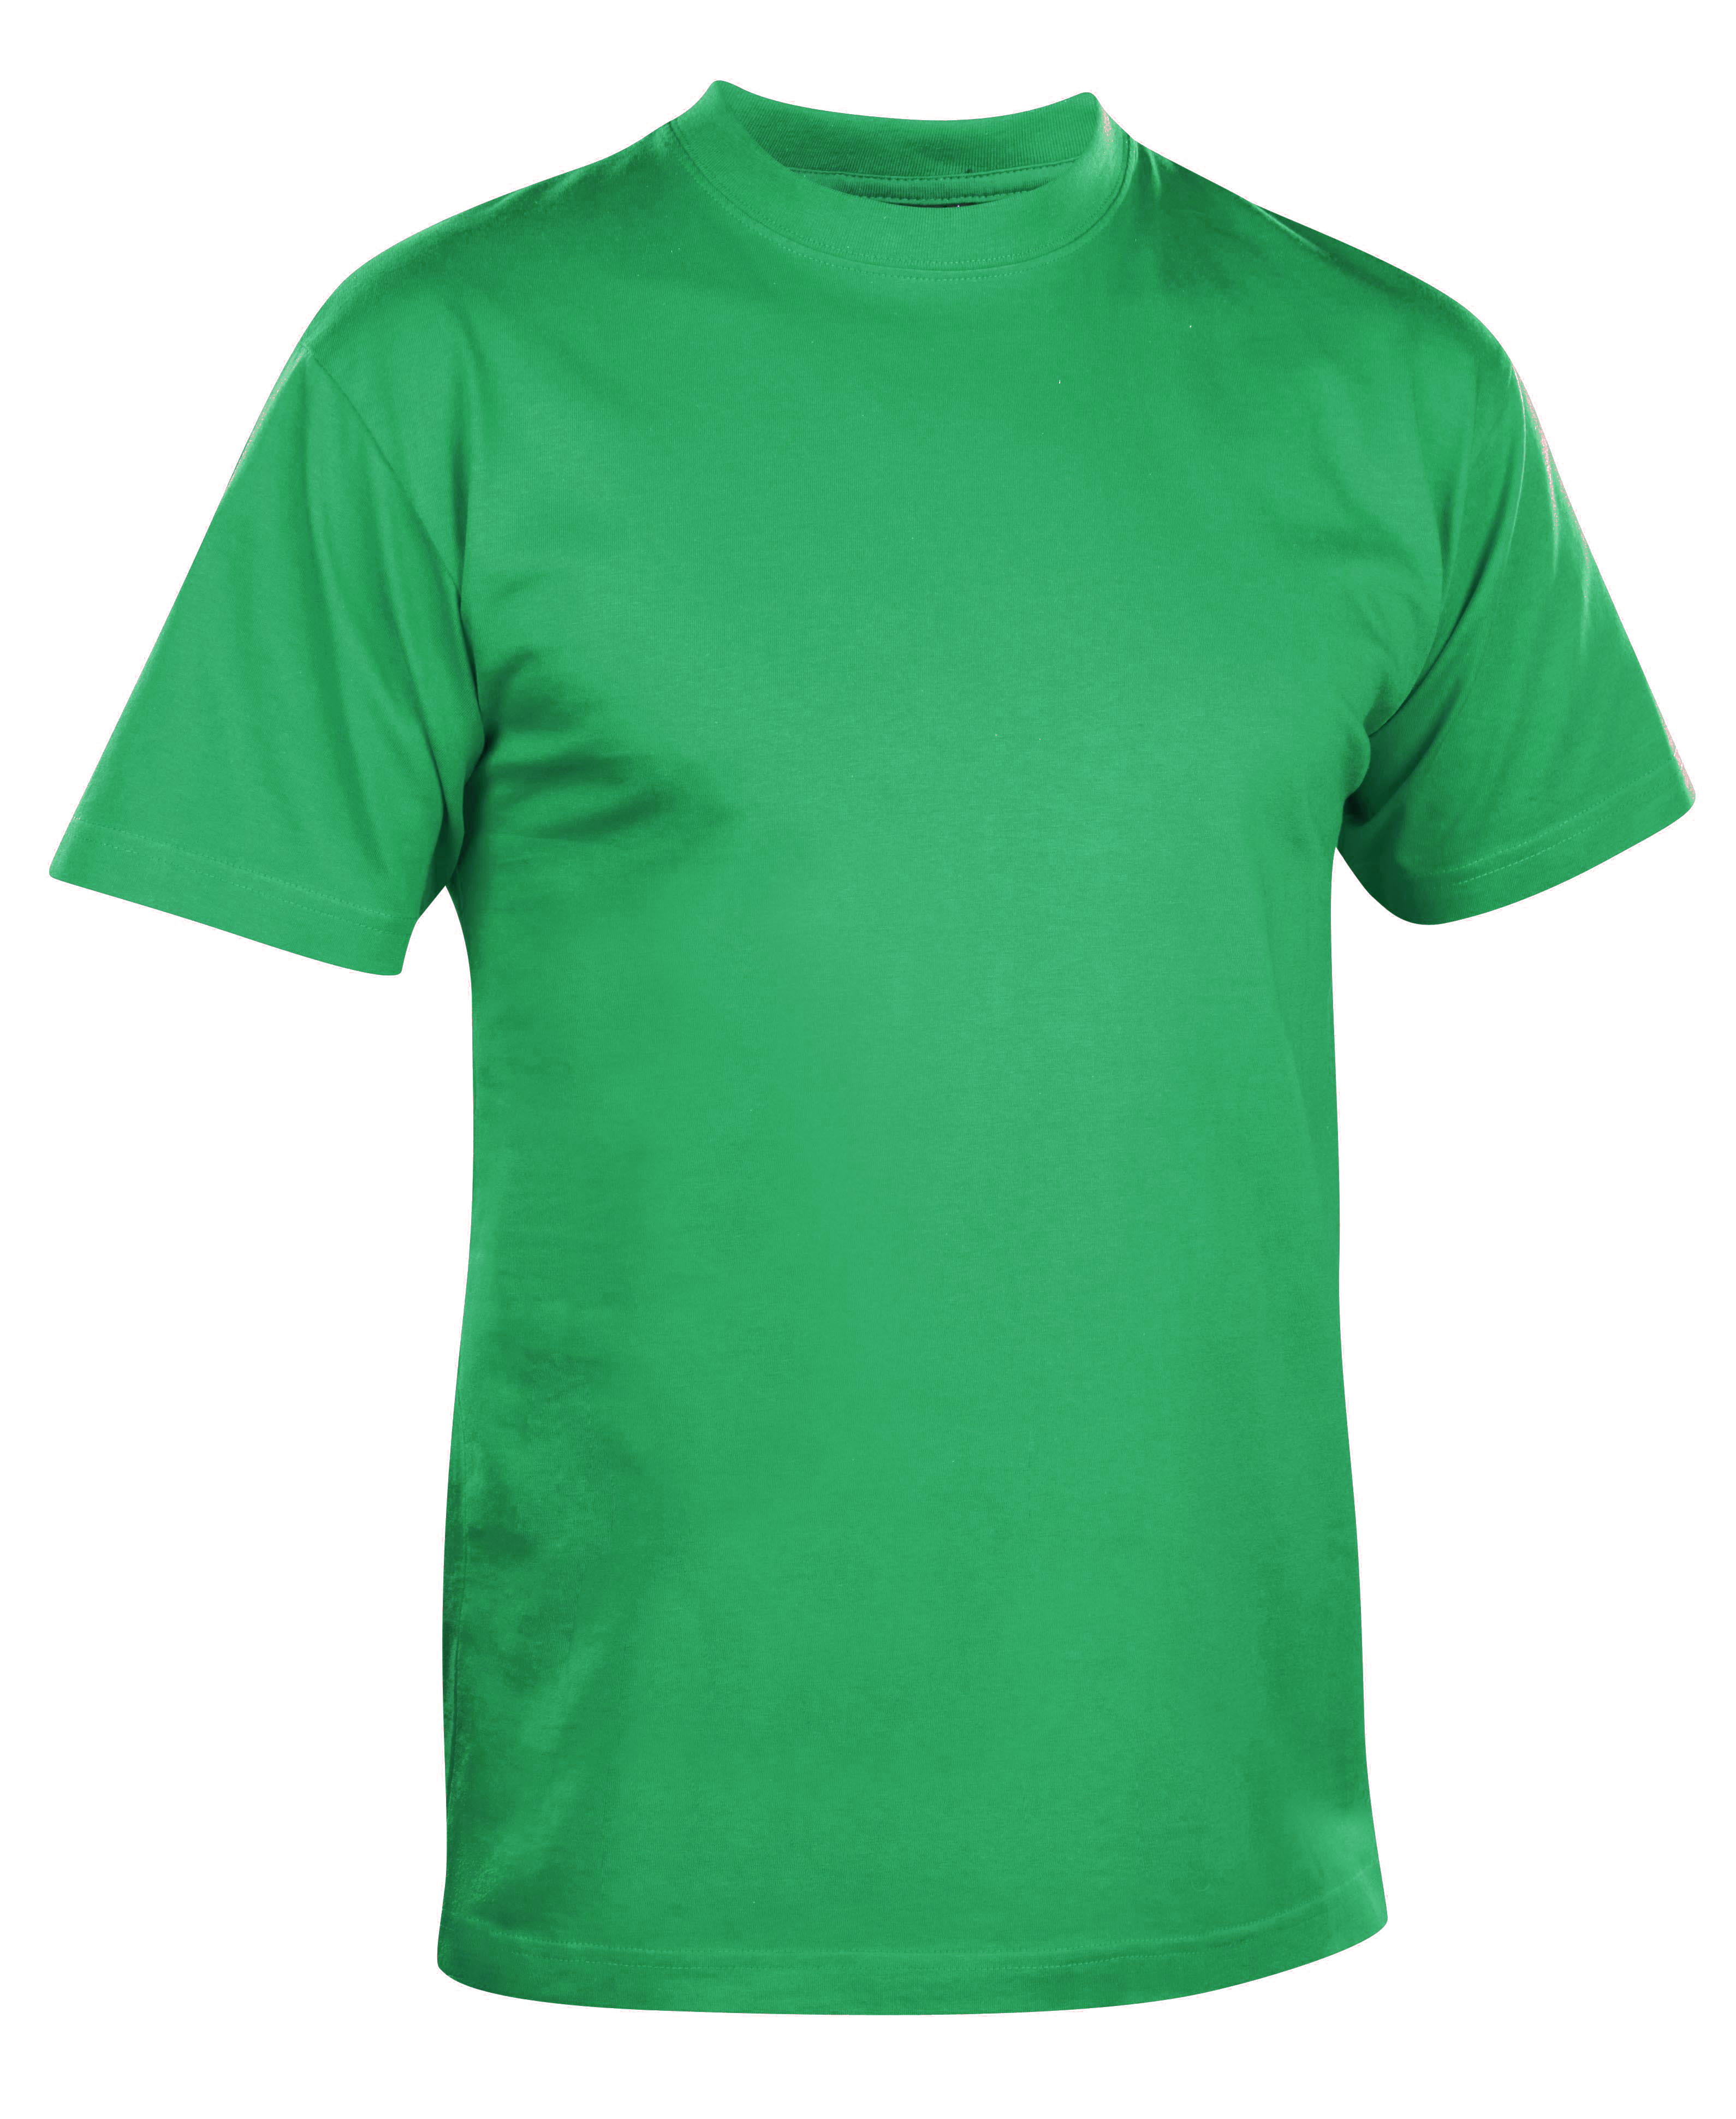 Green T-Shirt PNG Image - PurePNG | Free transparent CC0 ...